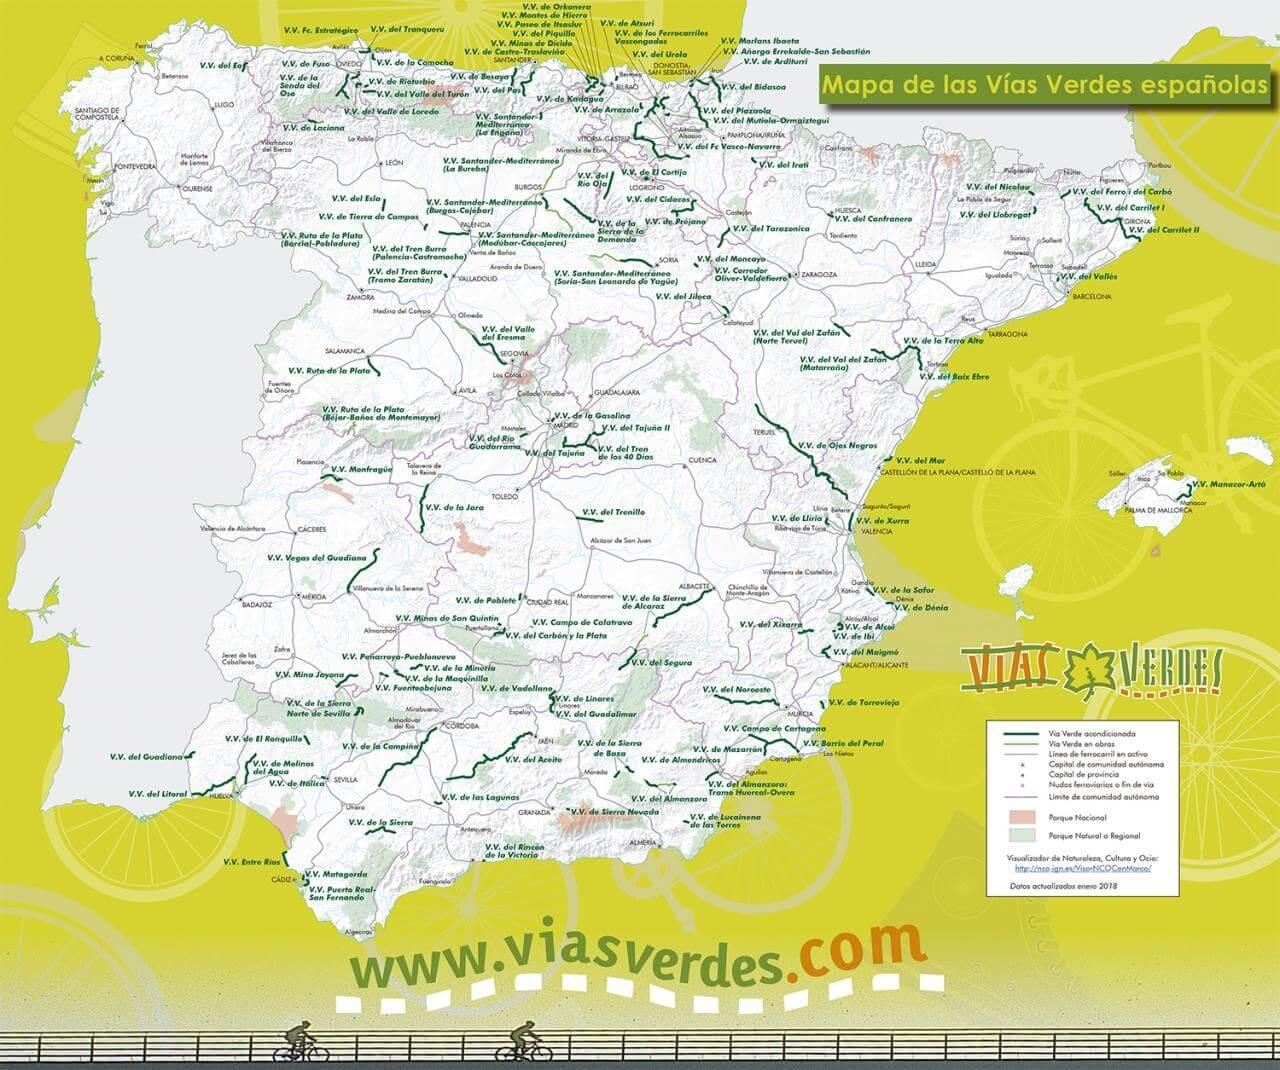 mapa-vias-verdes